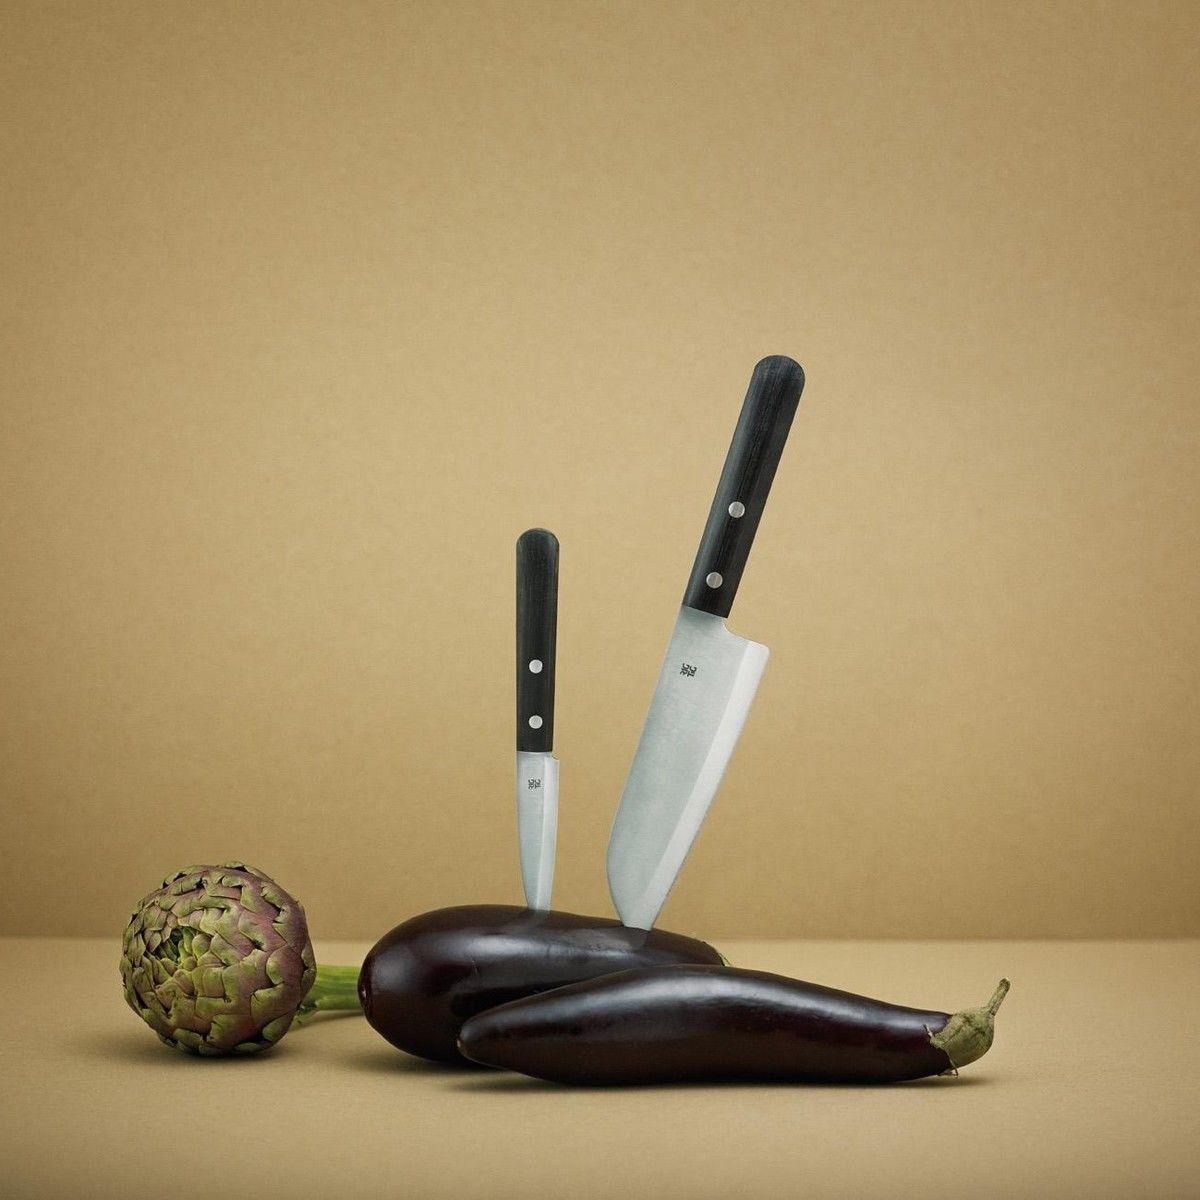 rig tig easy couteau d 39 l gumes rig tig. Black Bedroom Furniture Sets. Home Design Ideas